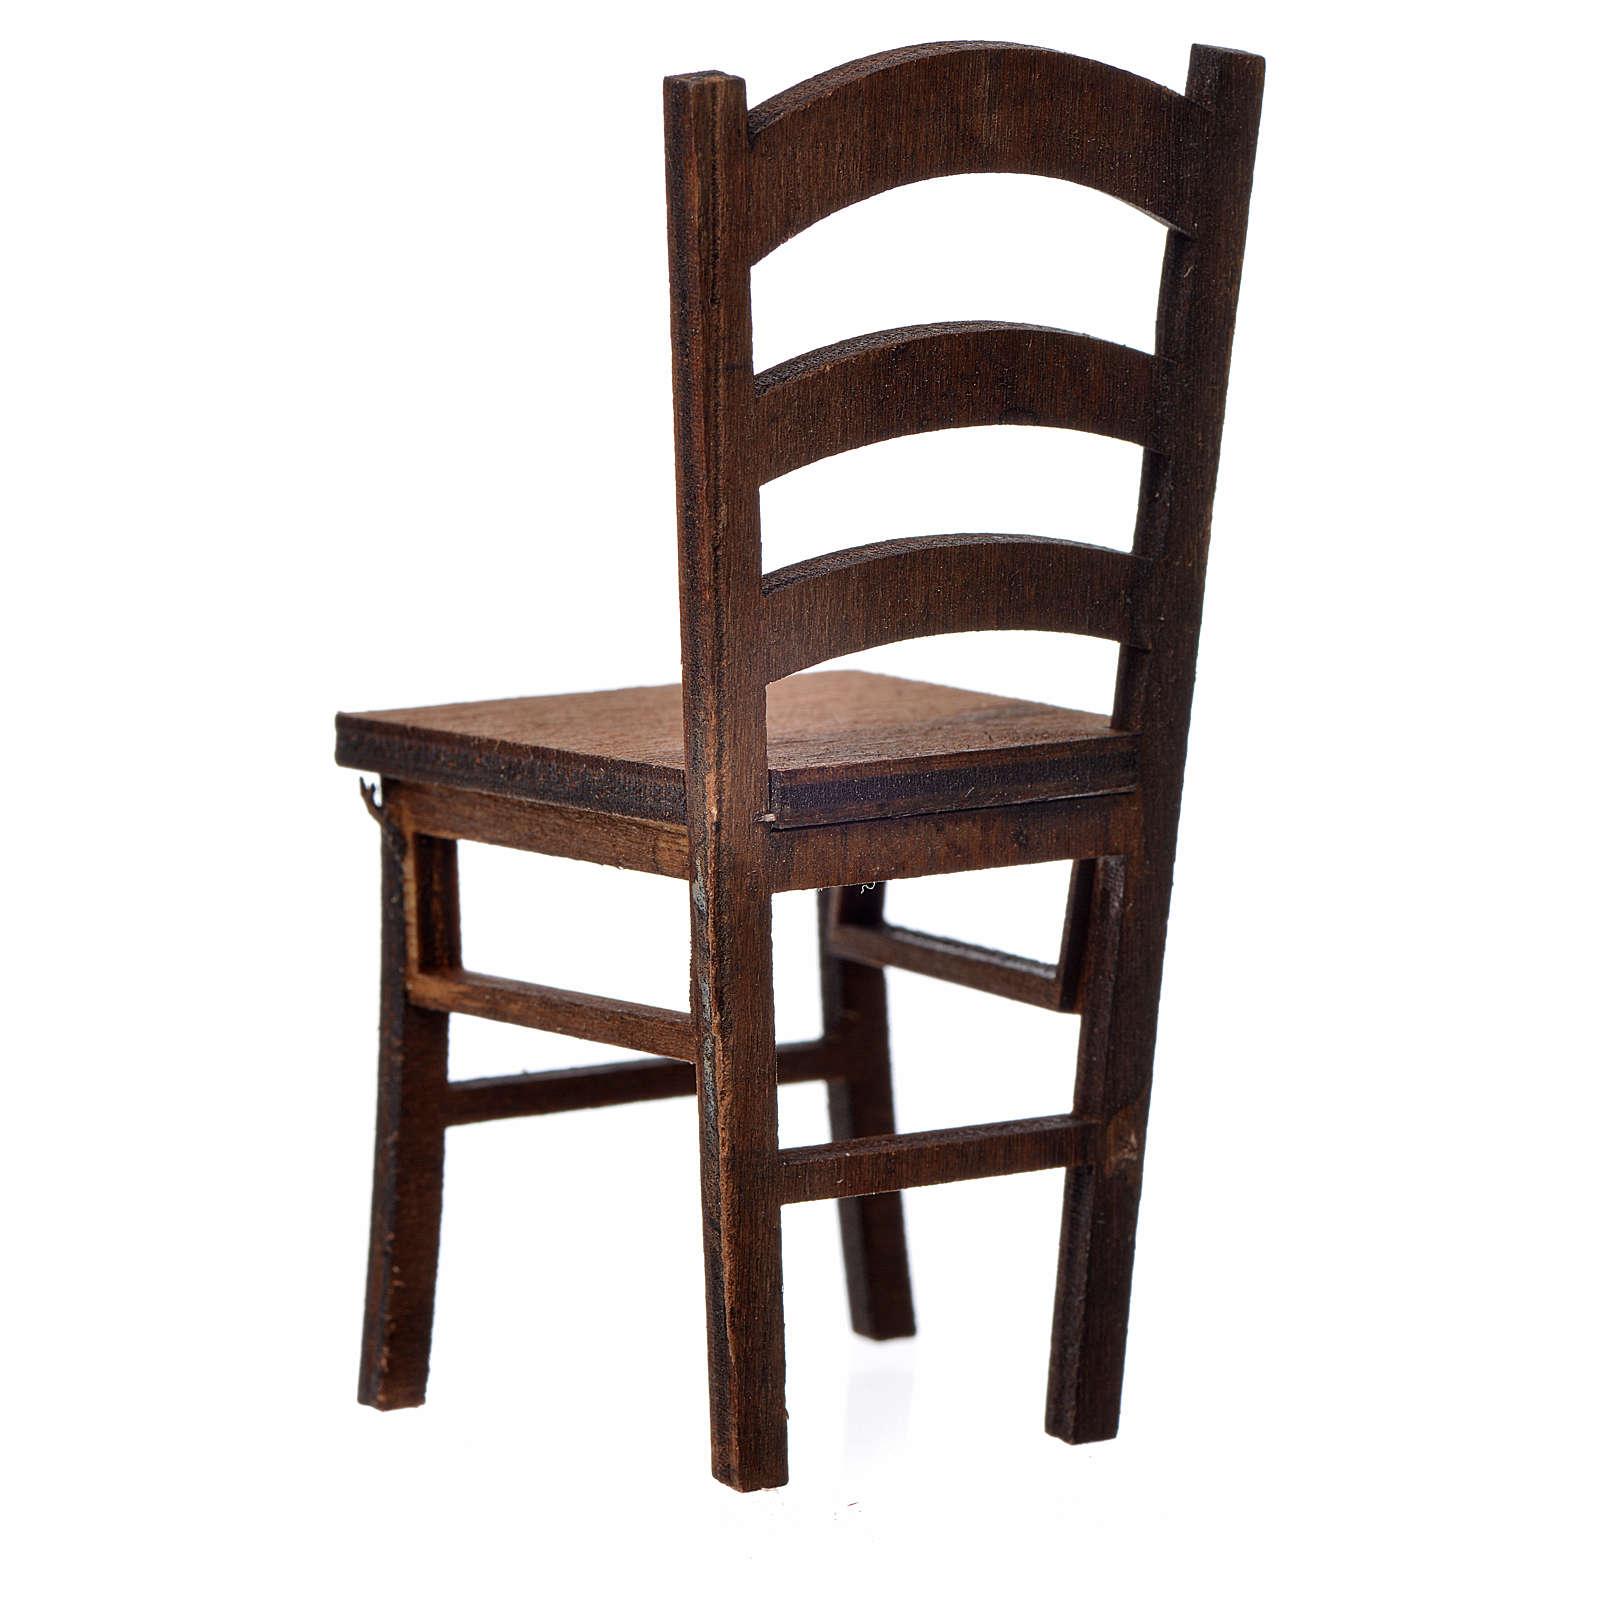 Sedia legno presepe 7,5x3,5x3,5 4